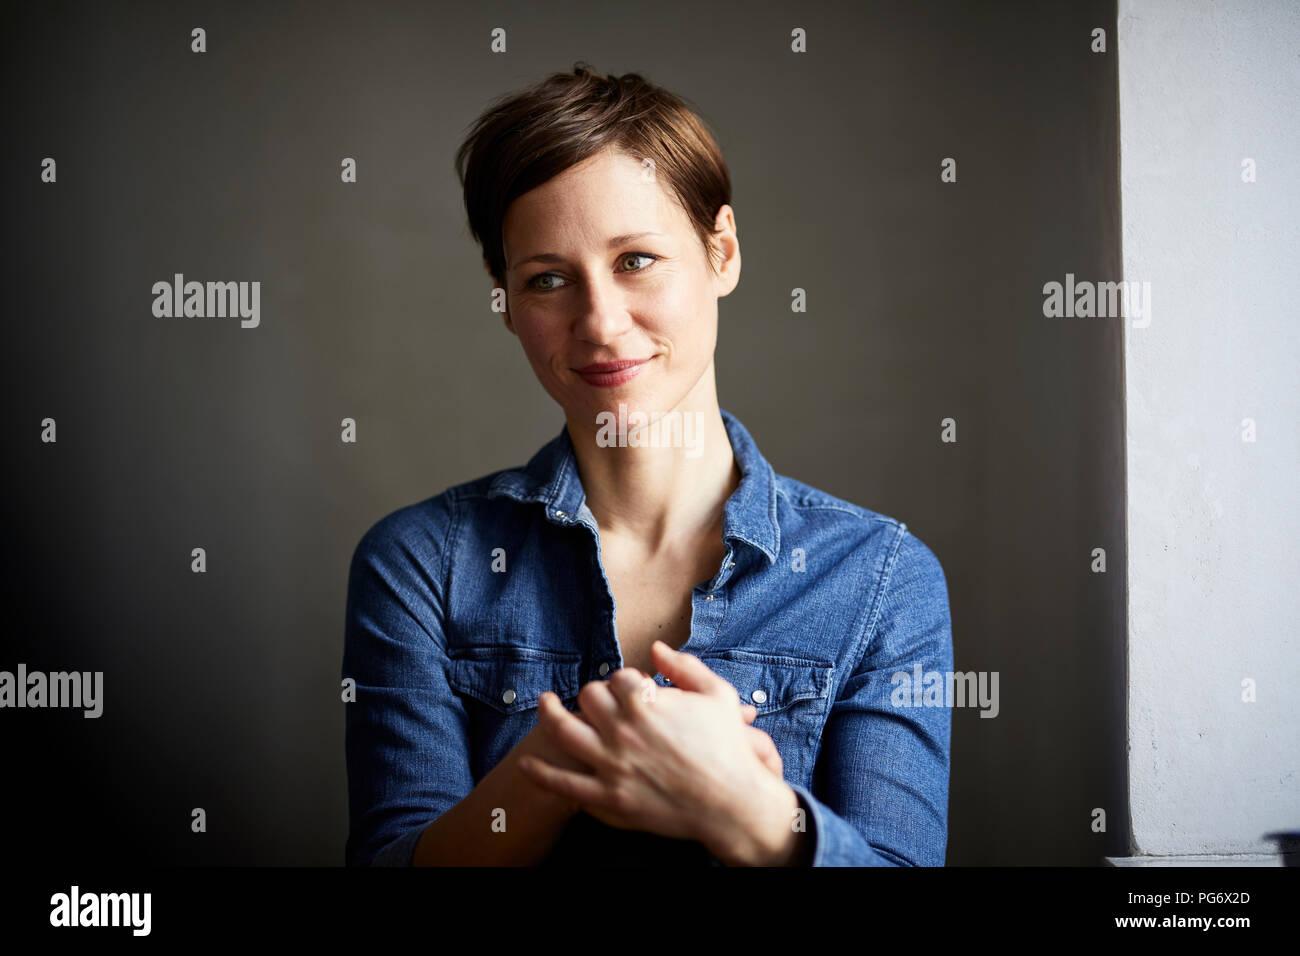 Portrait of ana ttractive woman, wearing denim shirt - Stock Image